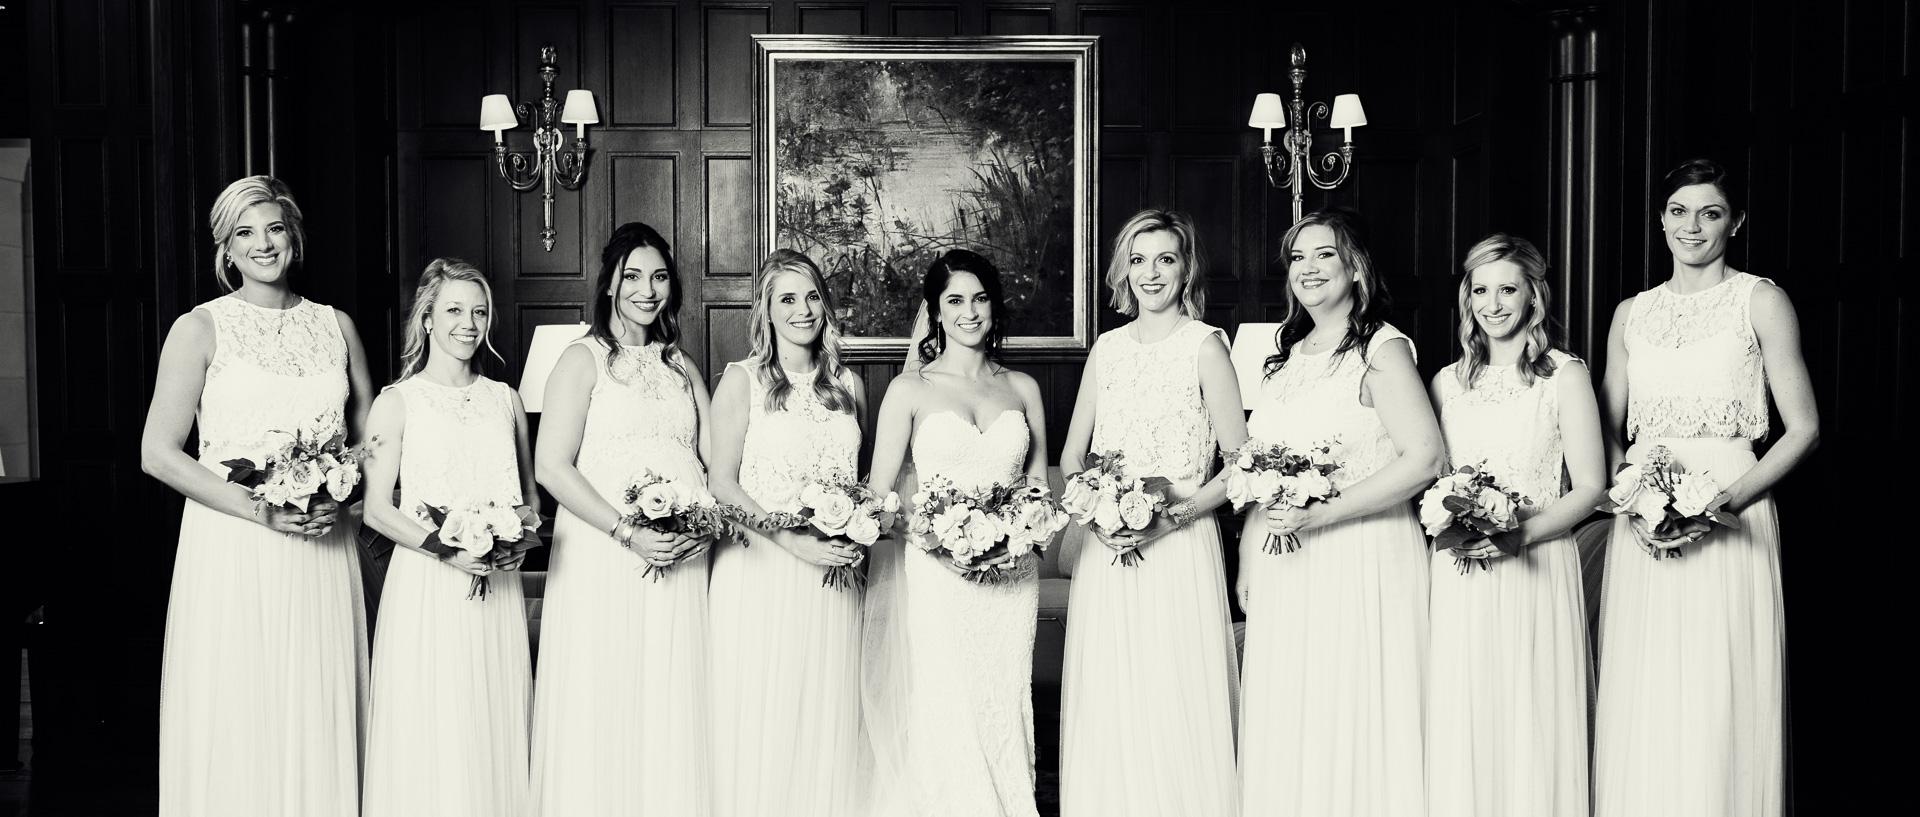 11 - wedding X - B-7010 - wide - _MG_1533.jpg